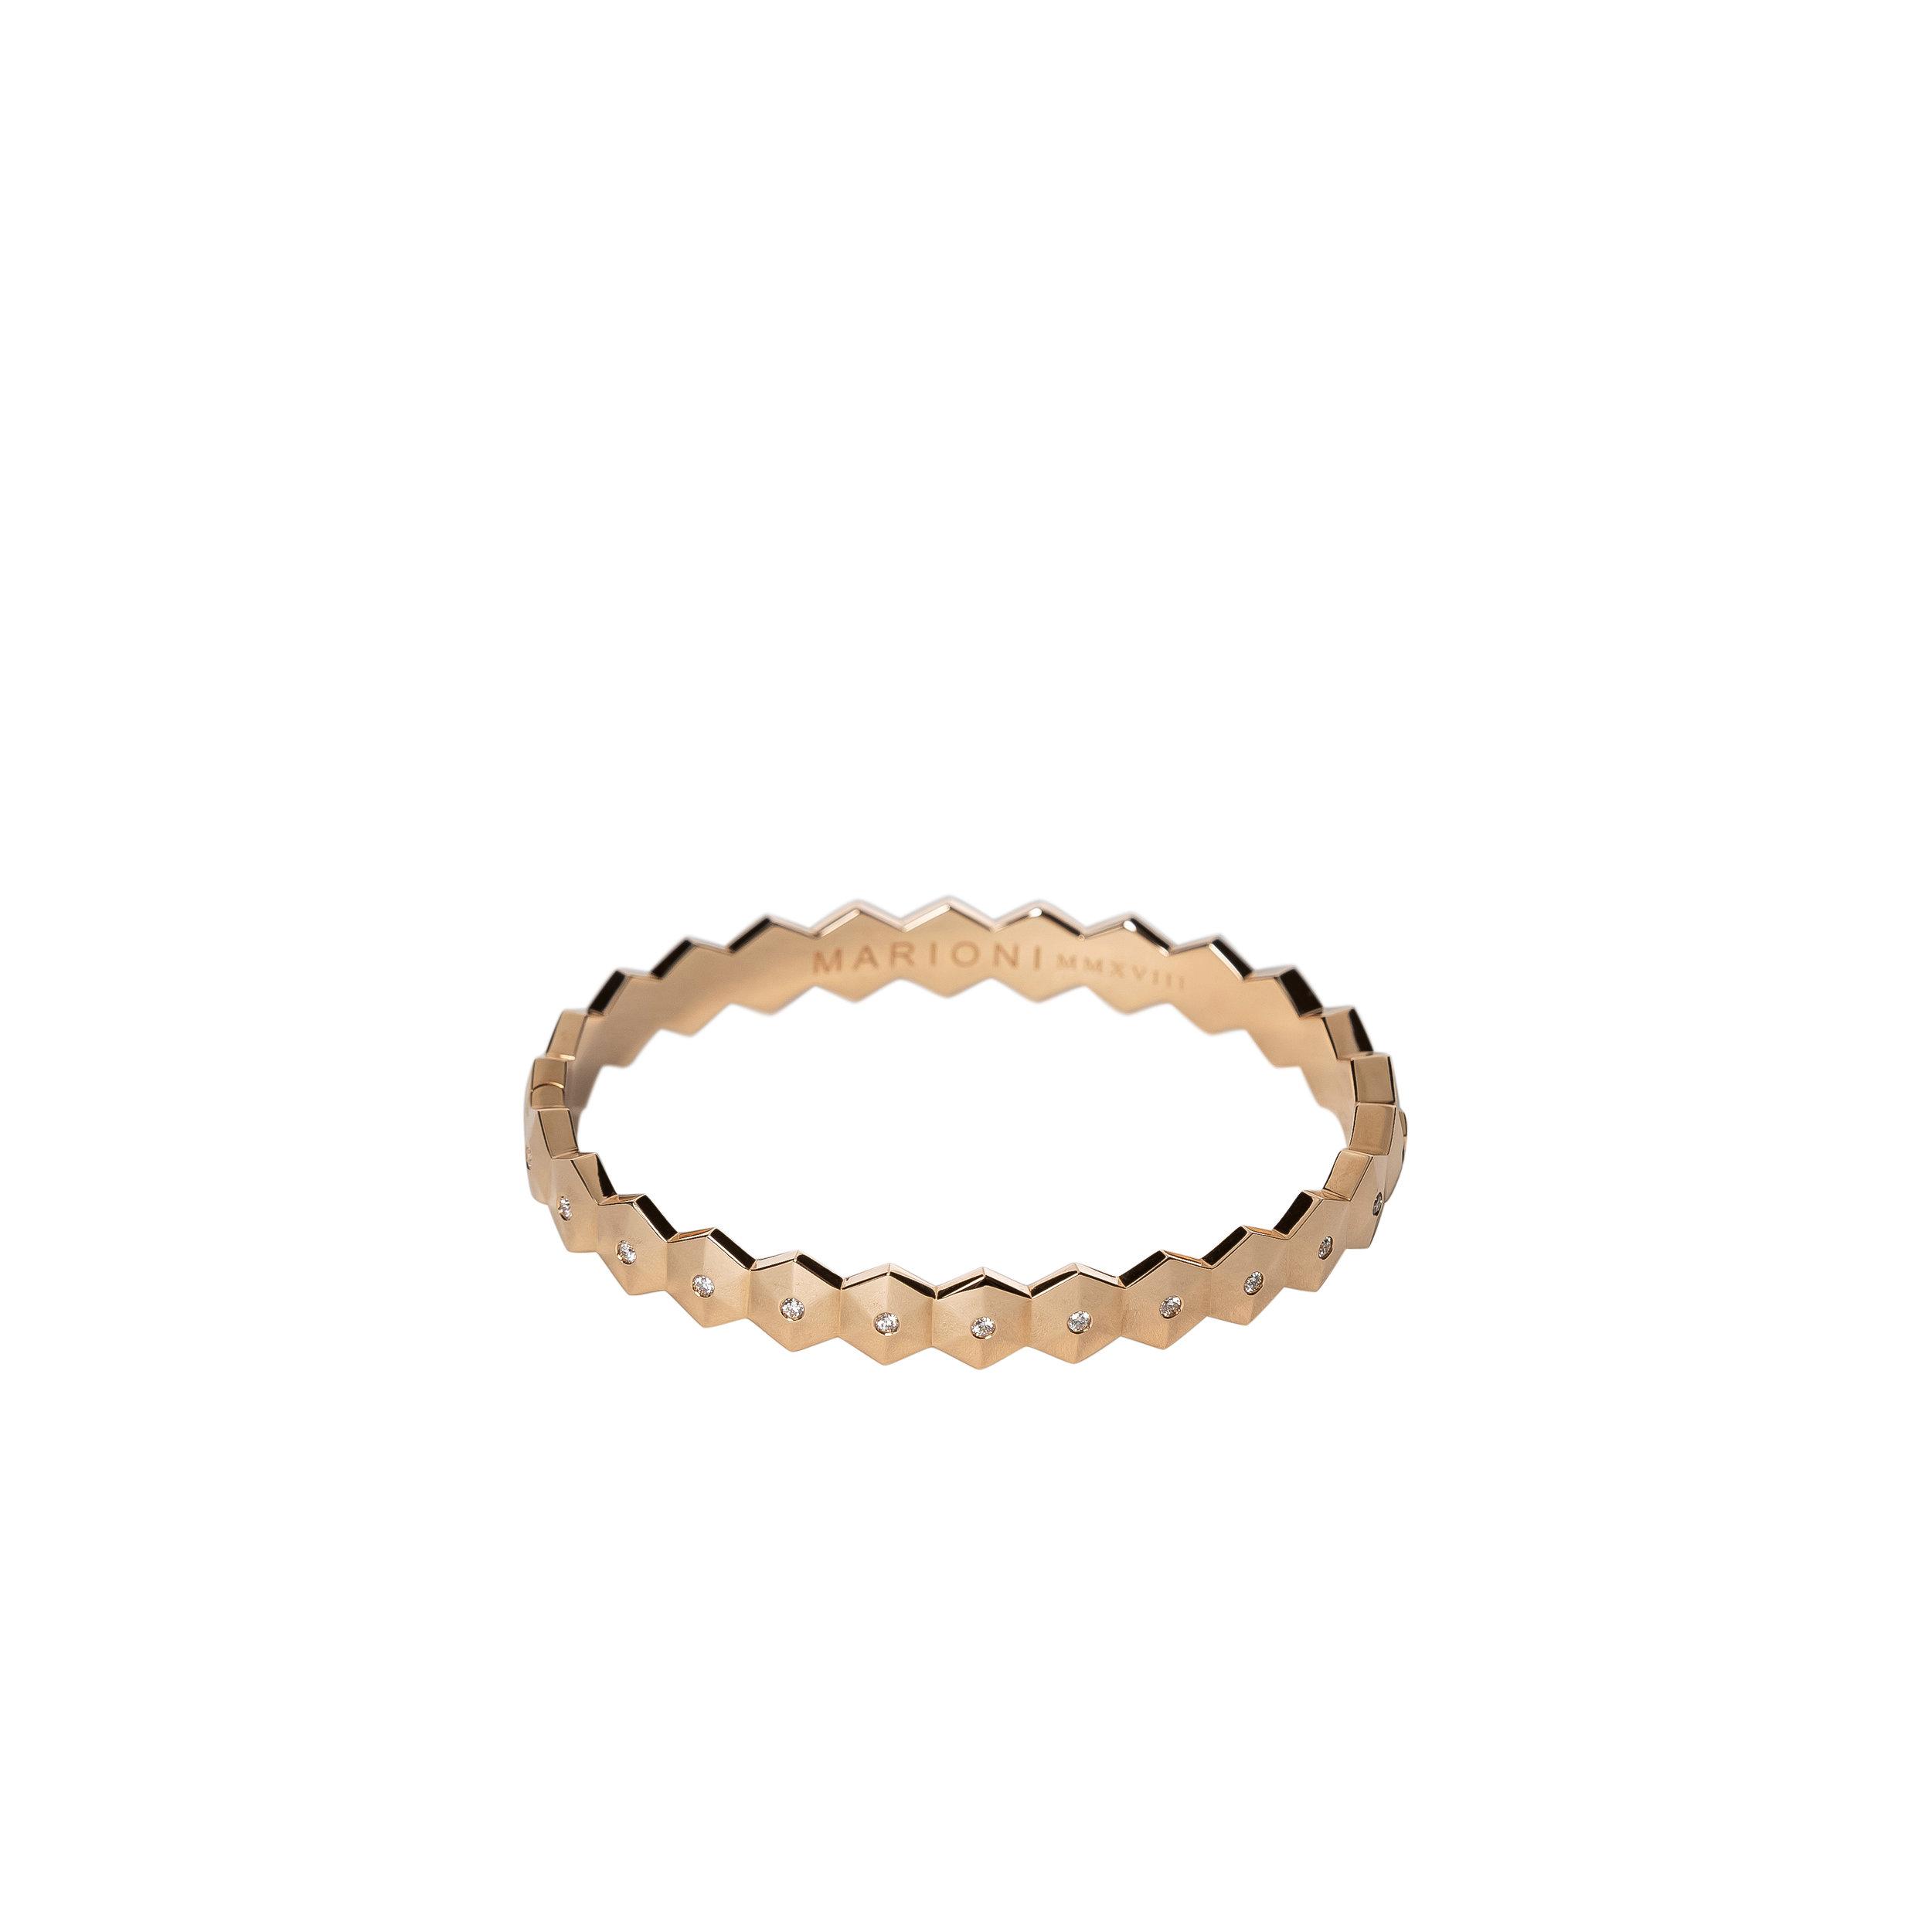 ABE1_Marioni_Jewelry_Studio_Products_YELLOW_Bracelet.jpg